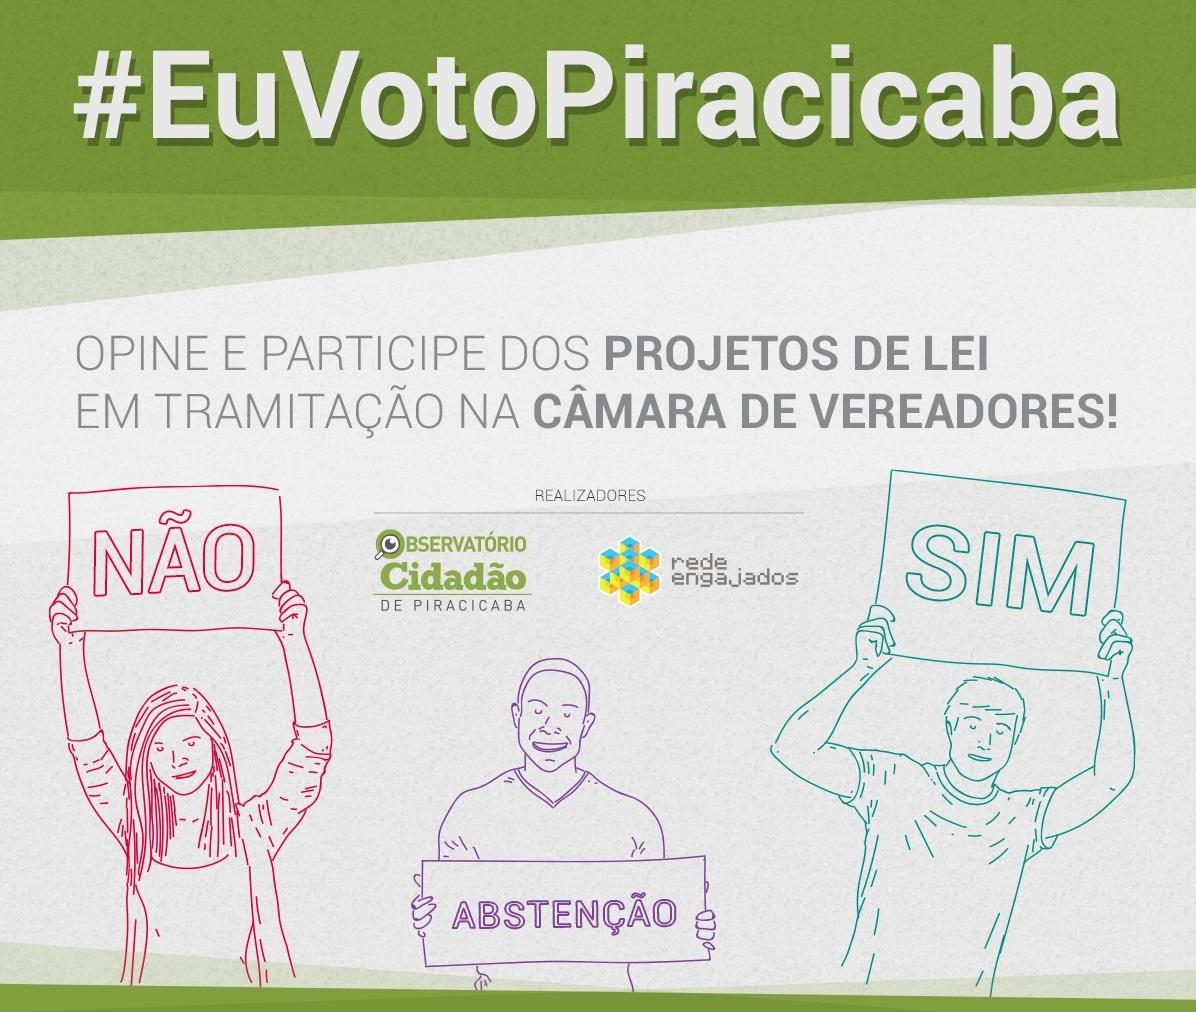 #EuVotoPiracicaba, opine e participe dos projetos de lei da Câmara dos Vereadores!